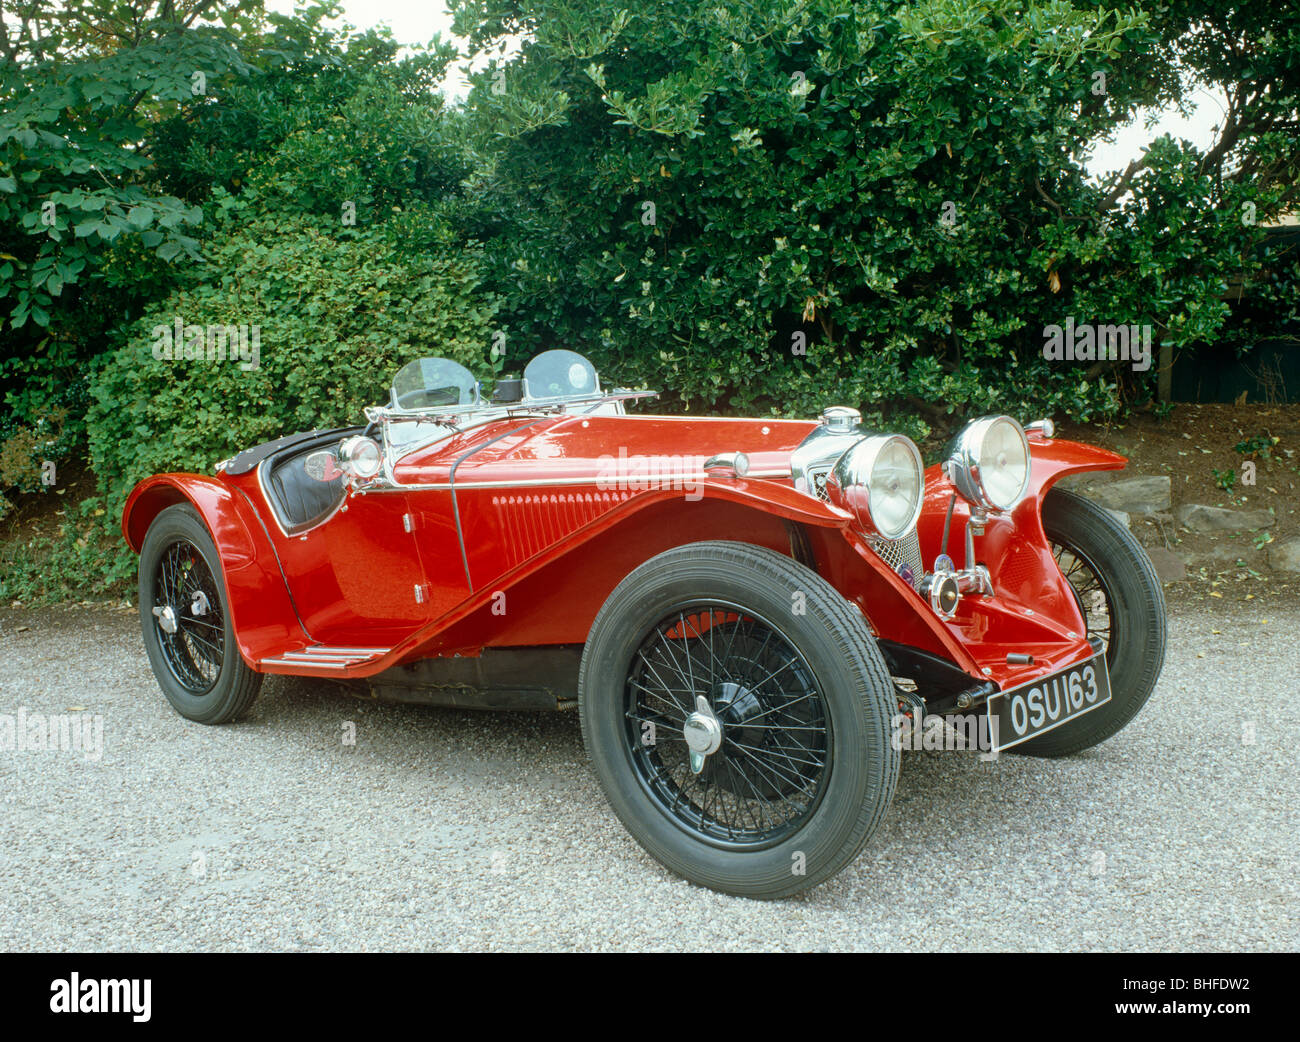 Car 1934 Riley 'Imp' 9MP - Stock Image